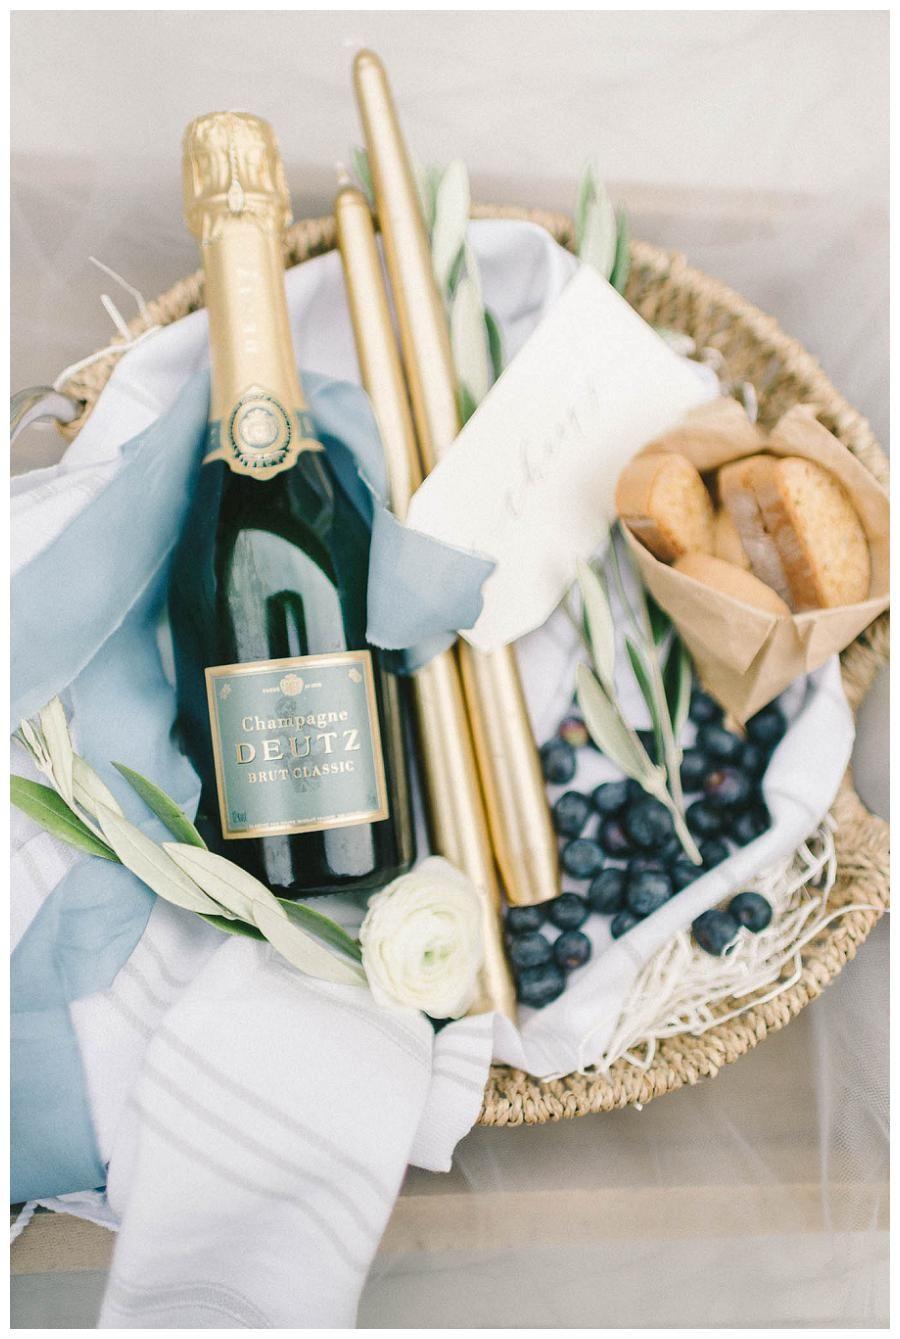 Wedding Welcome Basket By Marigold Grey Image Elizabeth Fogarty